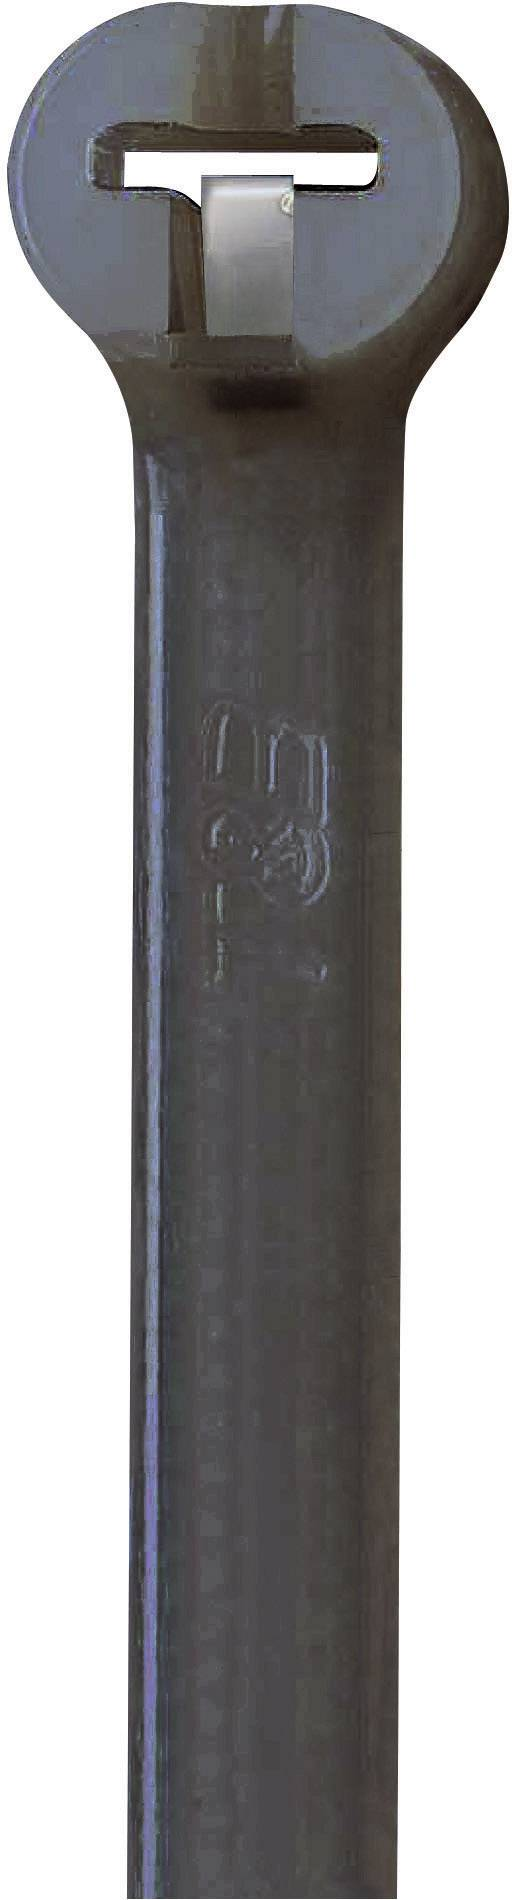 Sťahovacie pásky ABB TYB23MX TYB23MX, 92 mm, čierna, 1000 ks